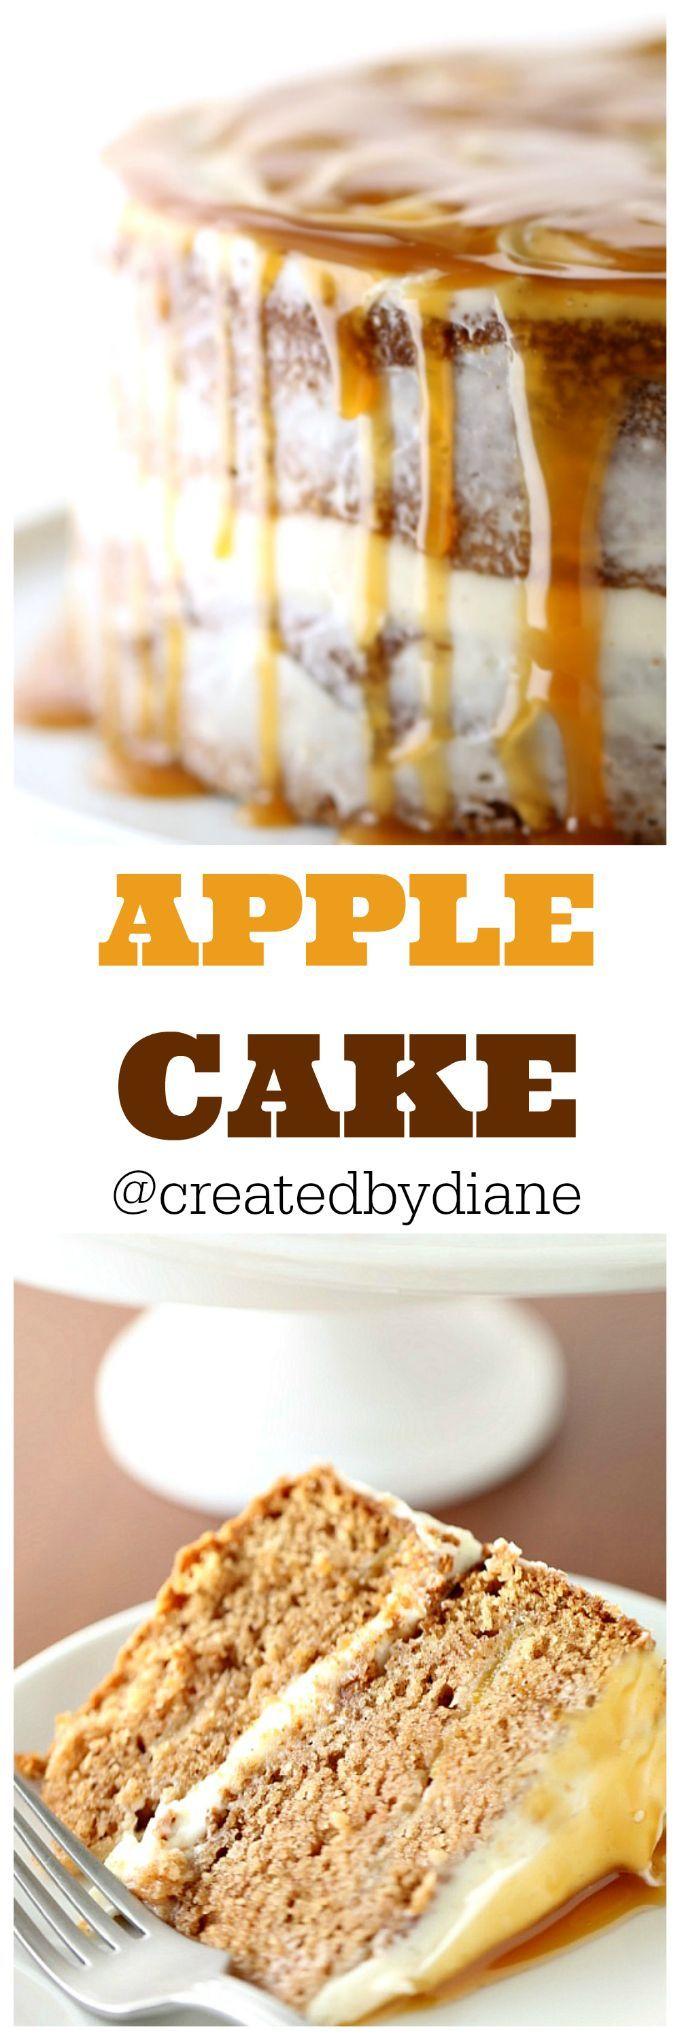 apple-cake-createdbydiane